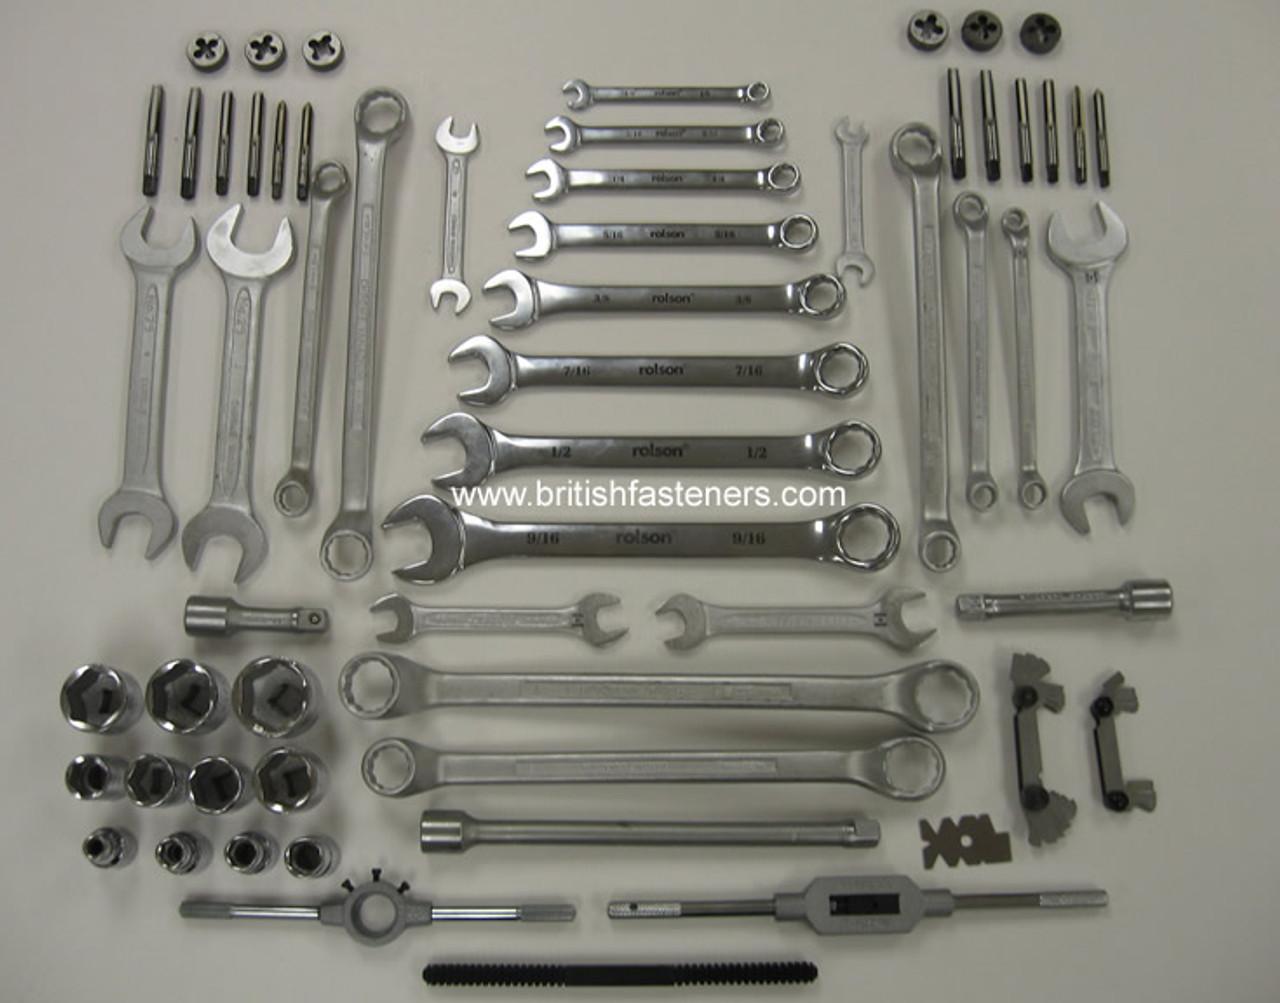 Ultimate Whitworth Tool Kit - (4010)